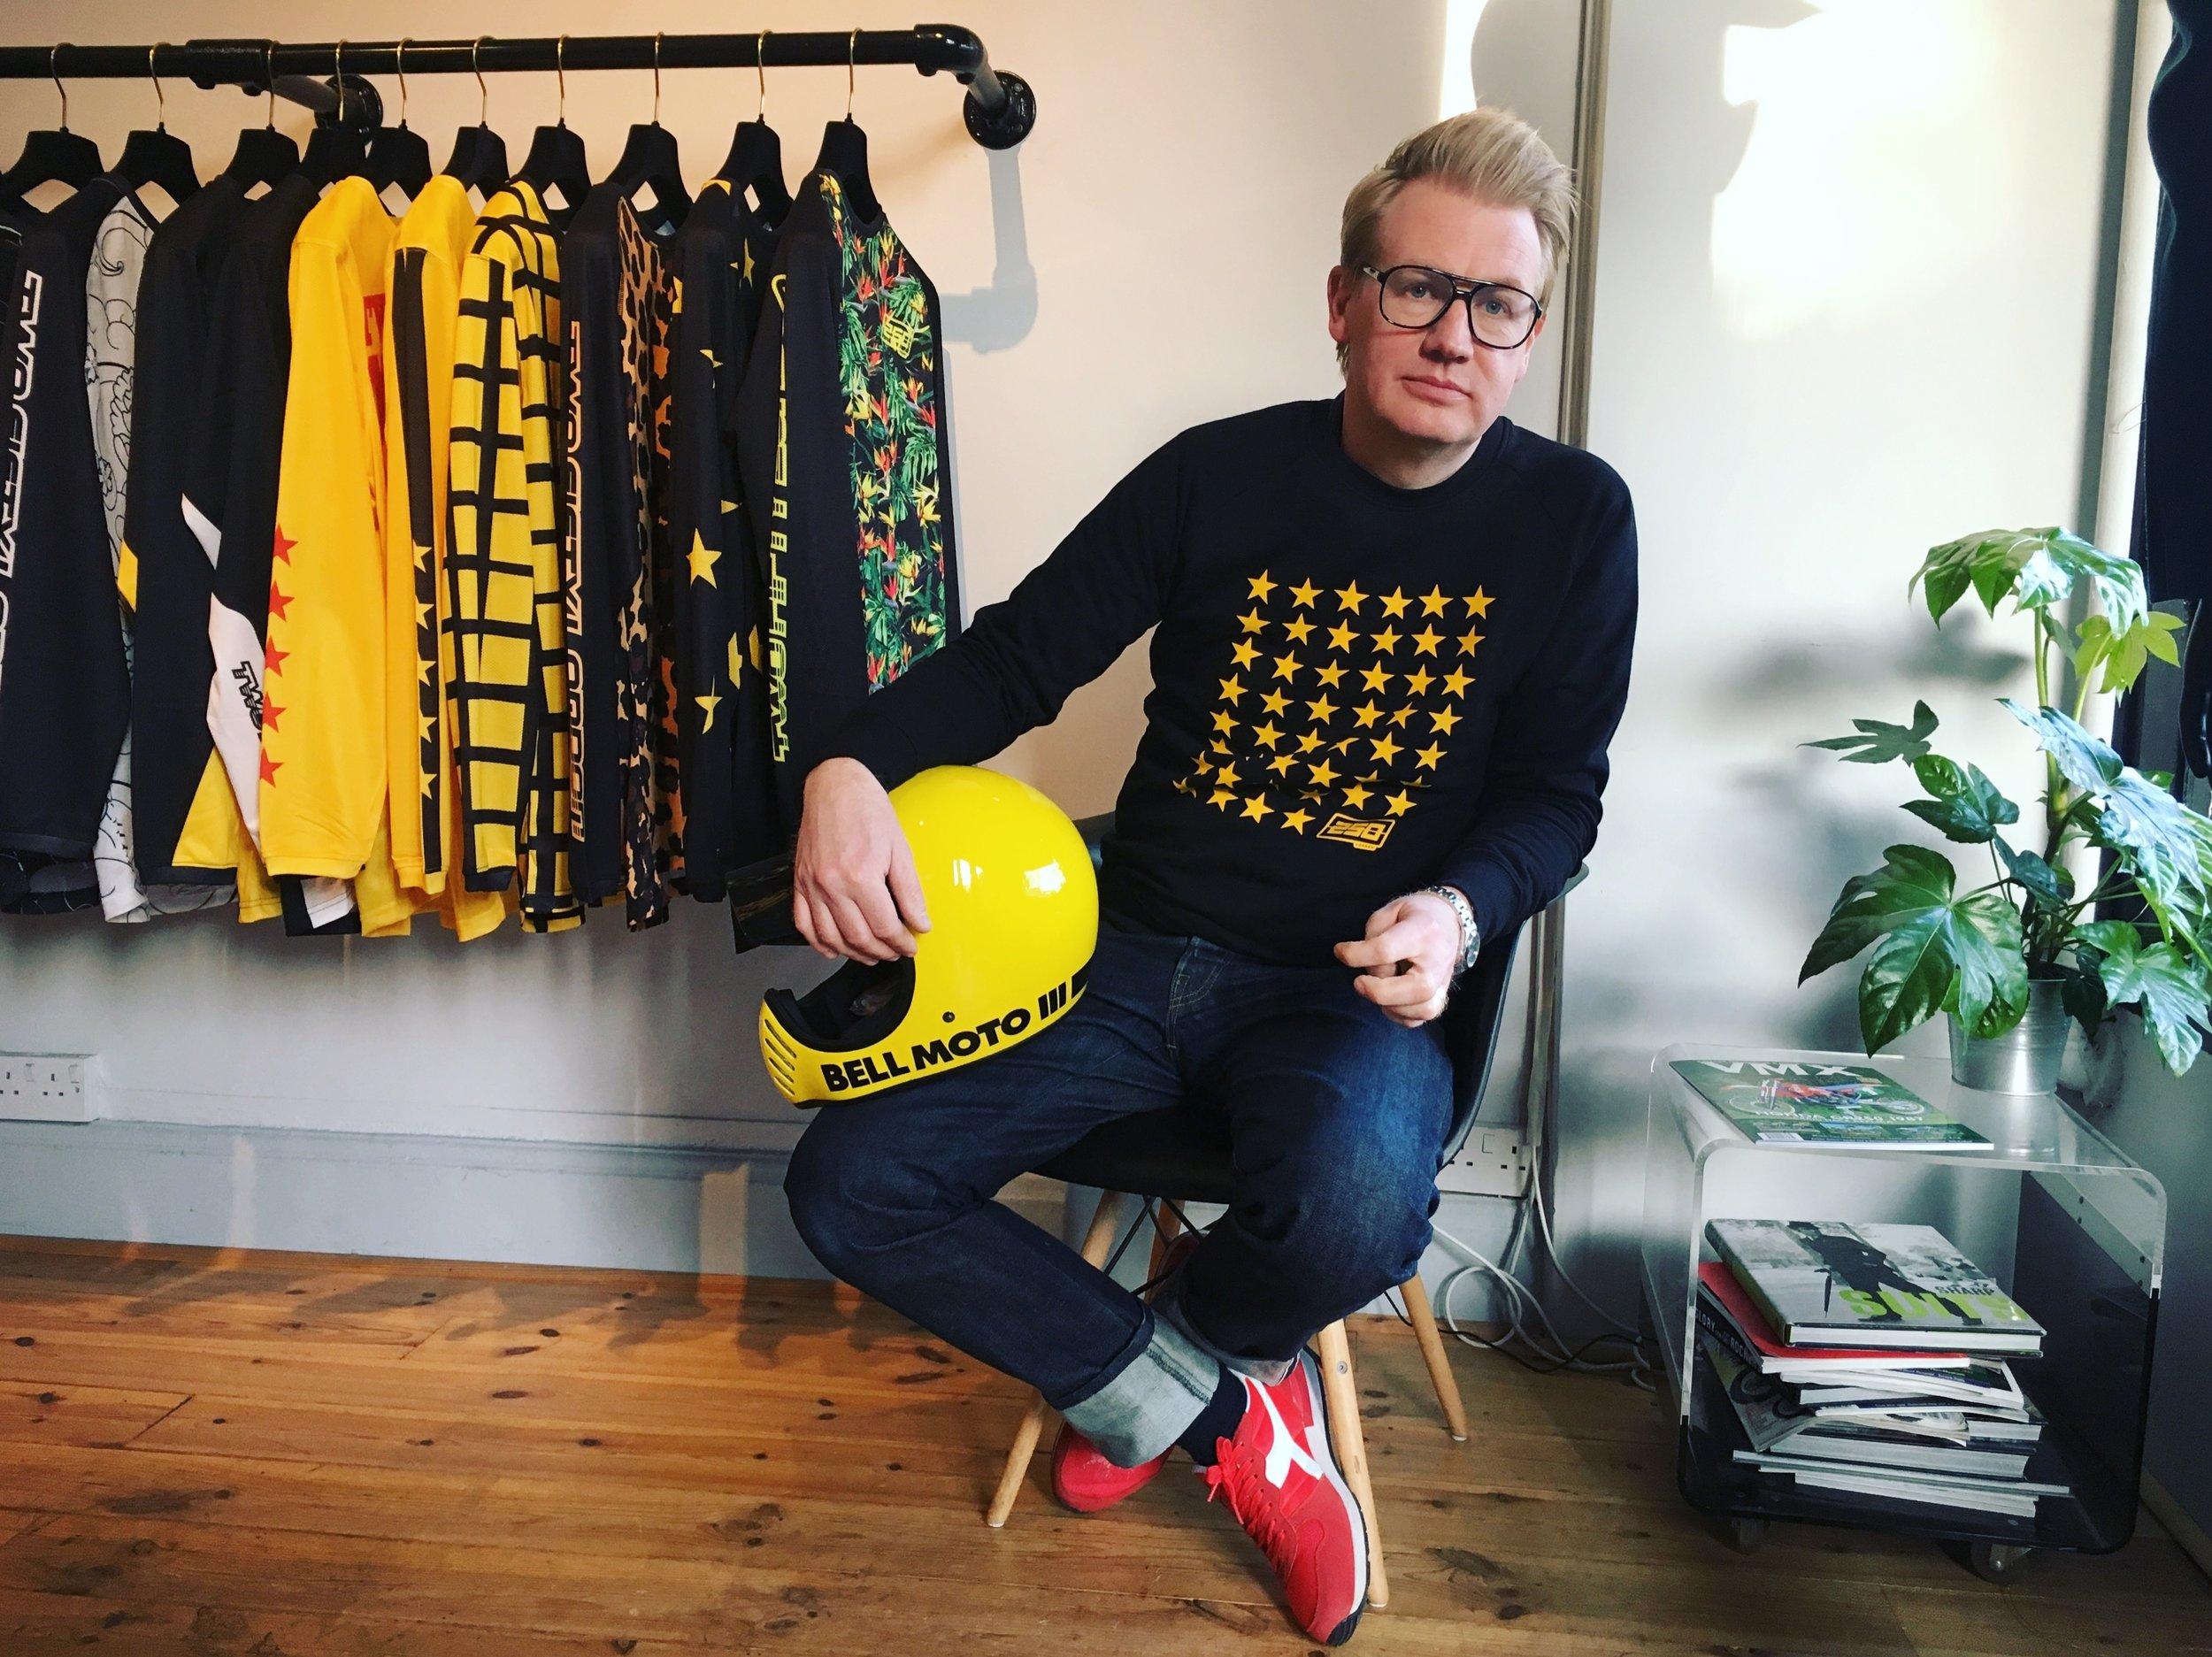 Adam Waite, the creative brain behind the brand